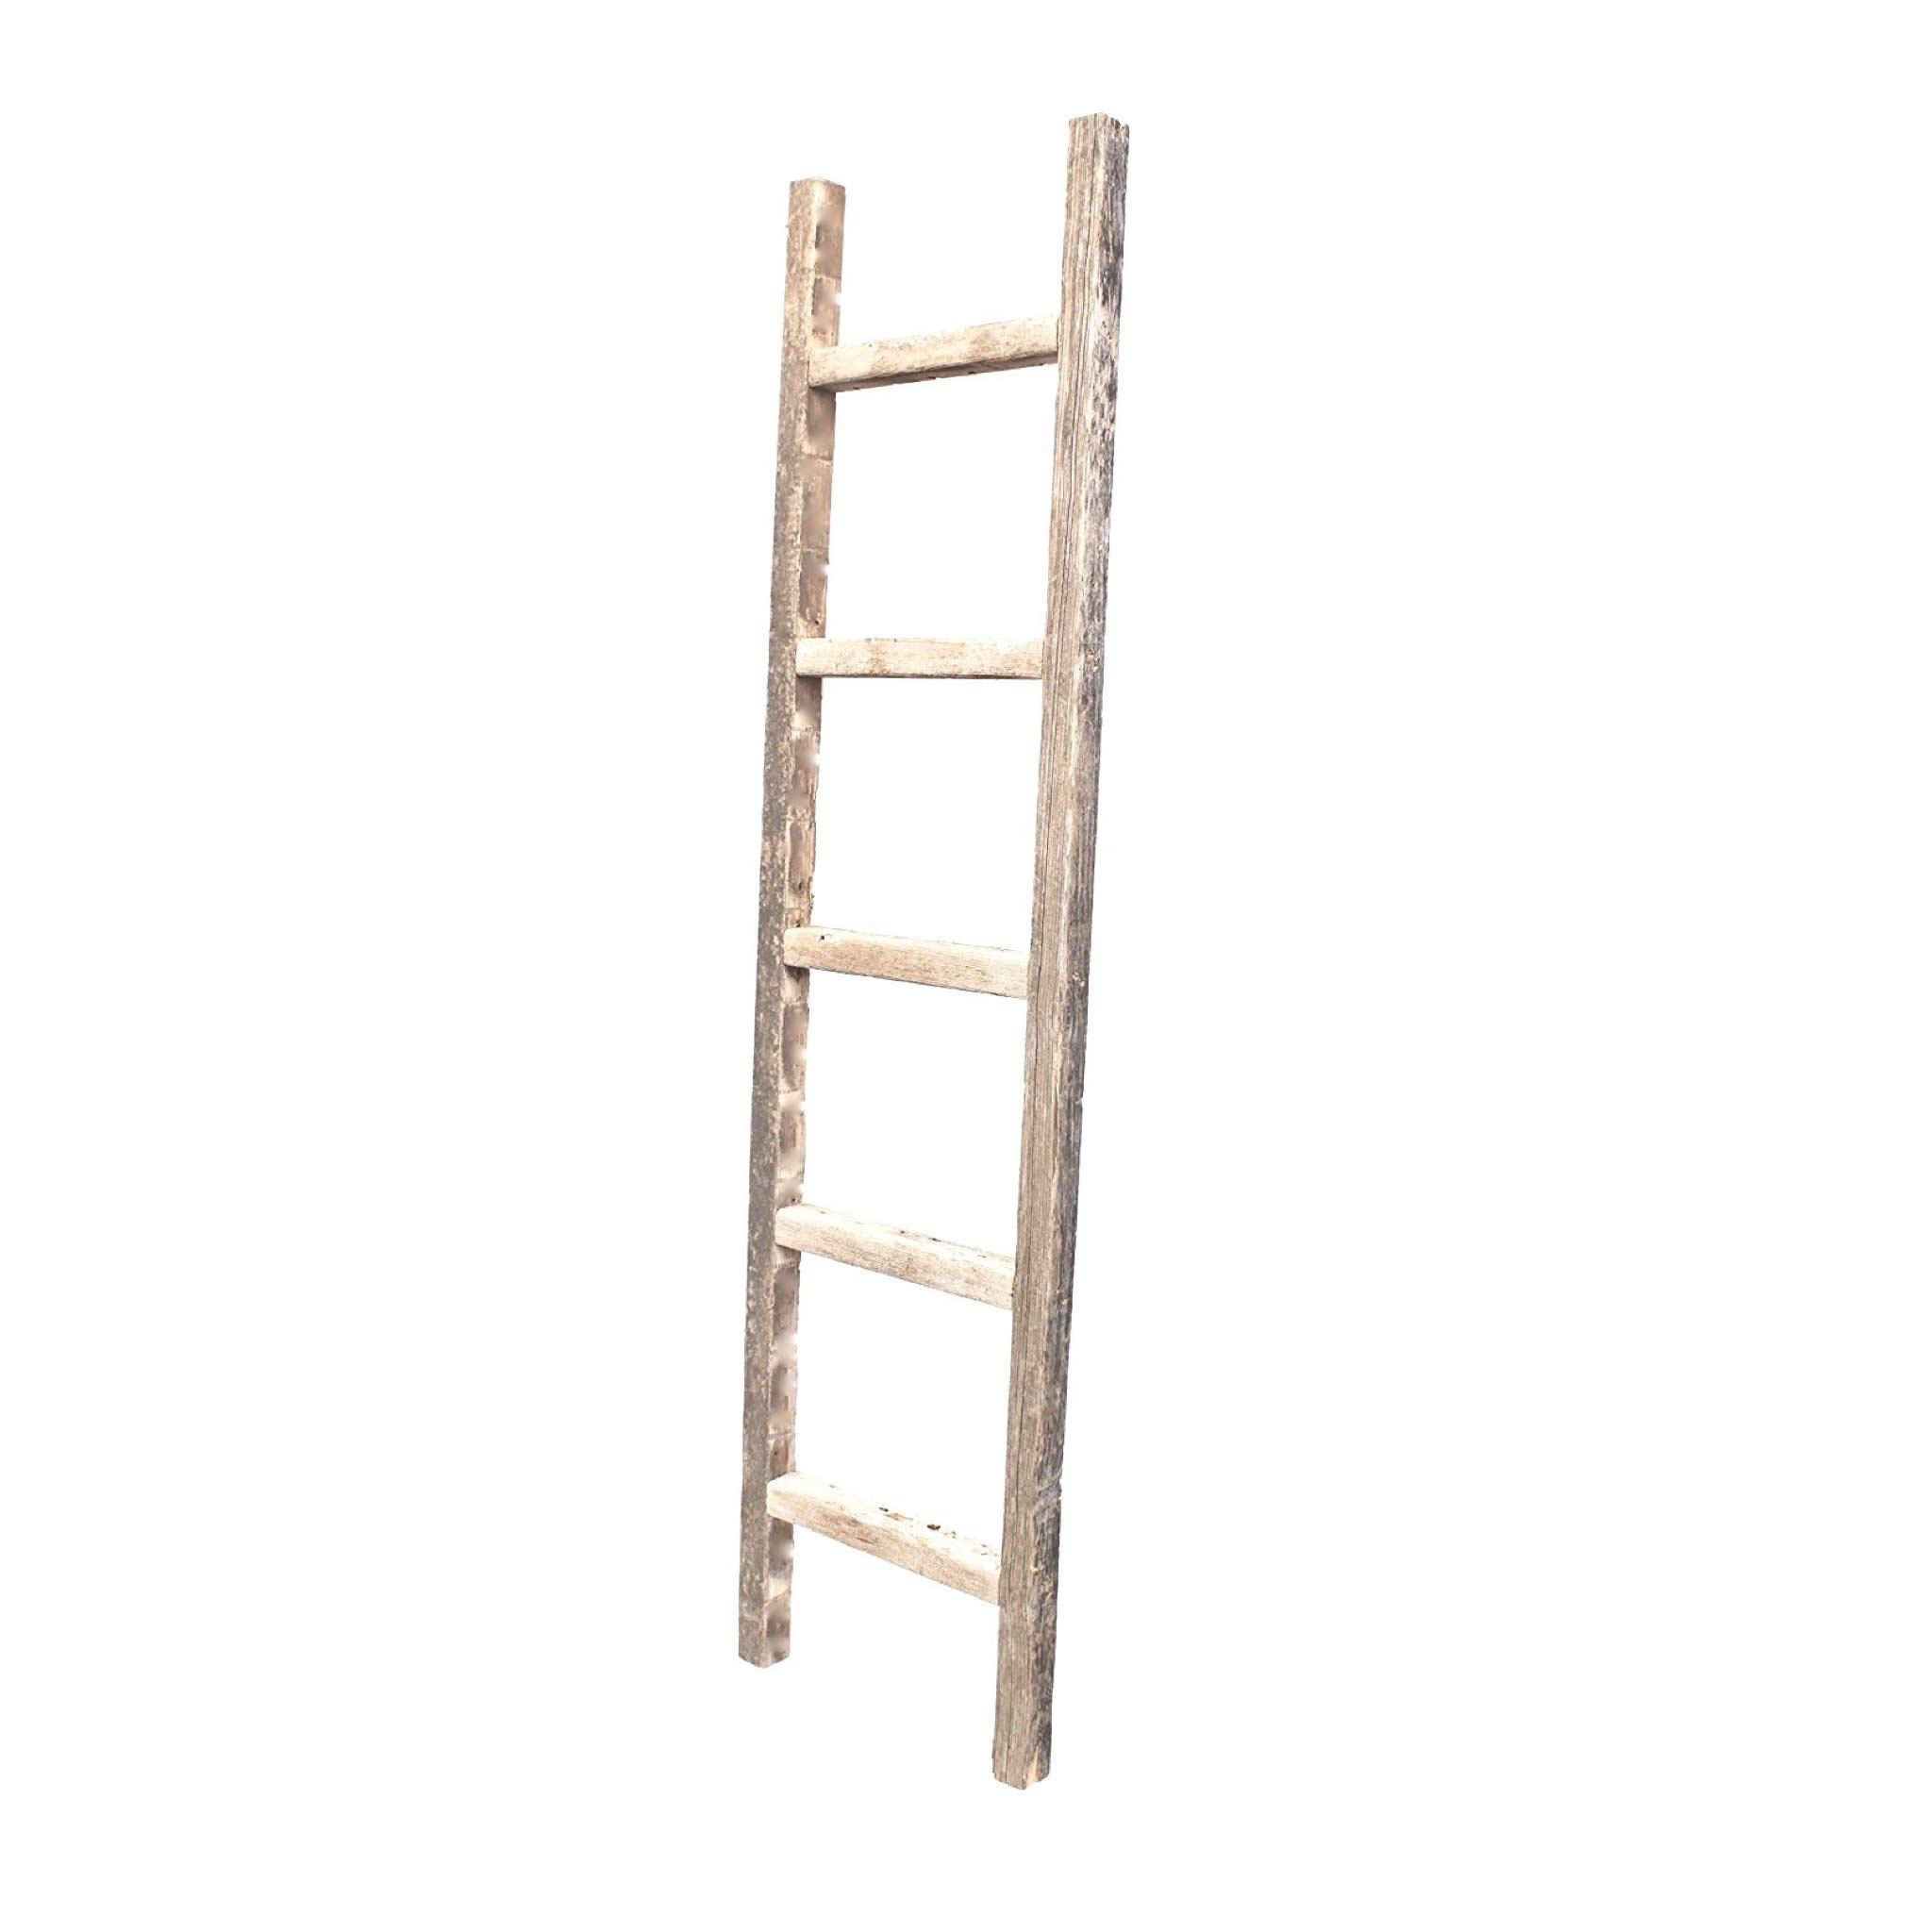 4 Step Rustic Weathered Grey Wood Ladder Shelf